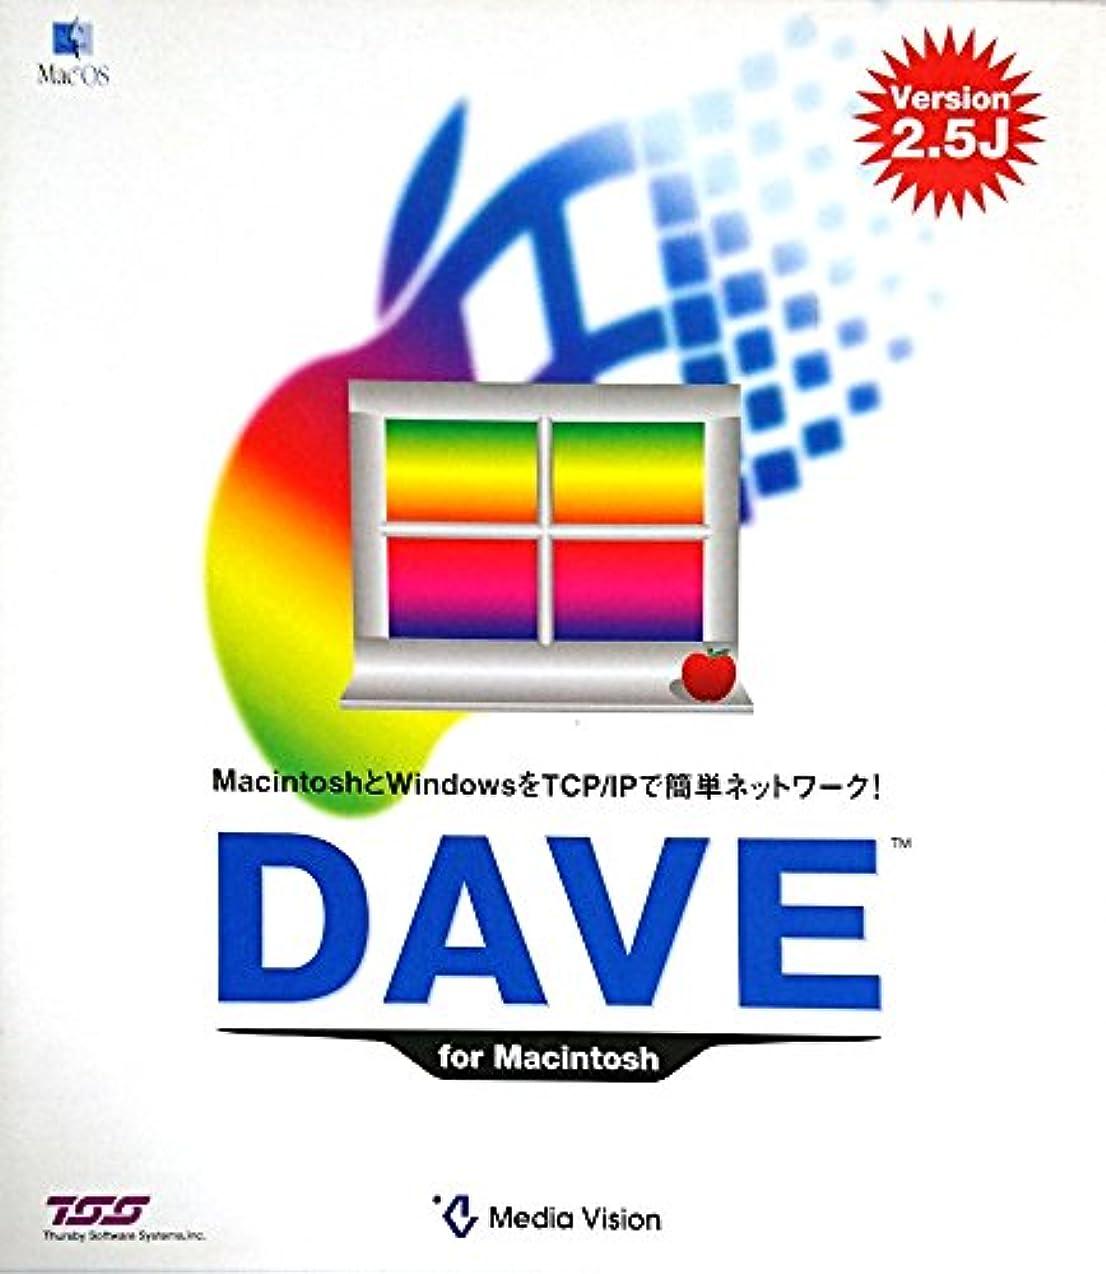 DAVE for Macintosh Version2.5J